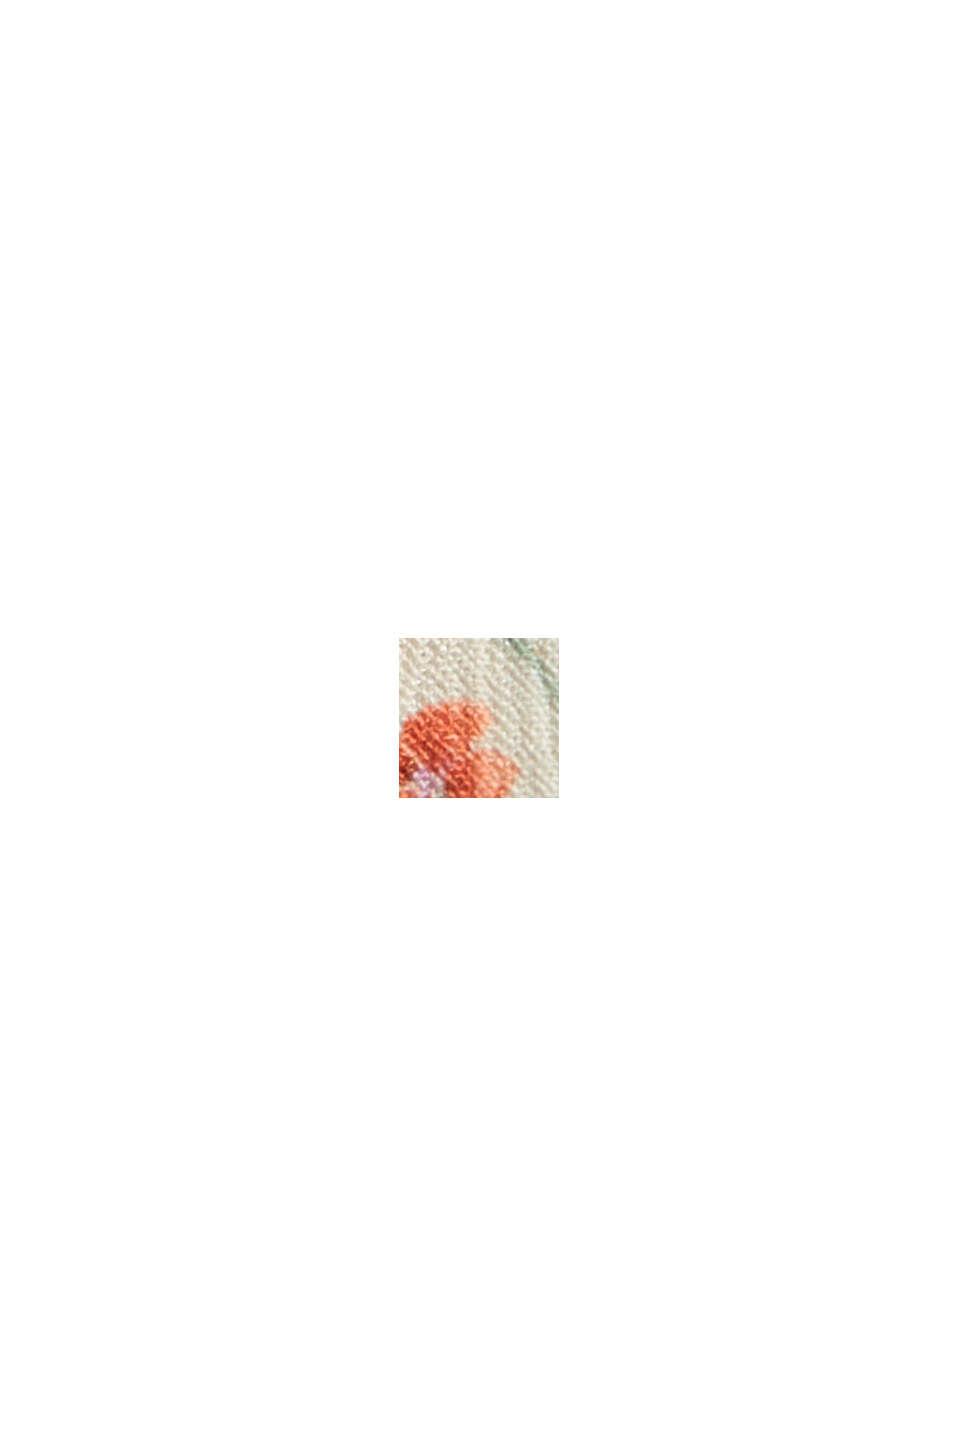 CURVY Blusa estampada en LENZING™ ECOVERO™, OFF WHITE, swatch